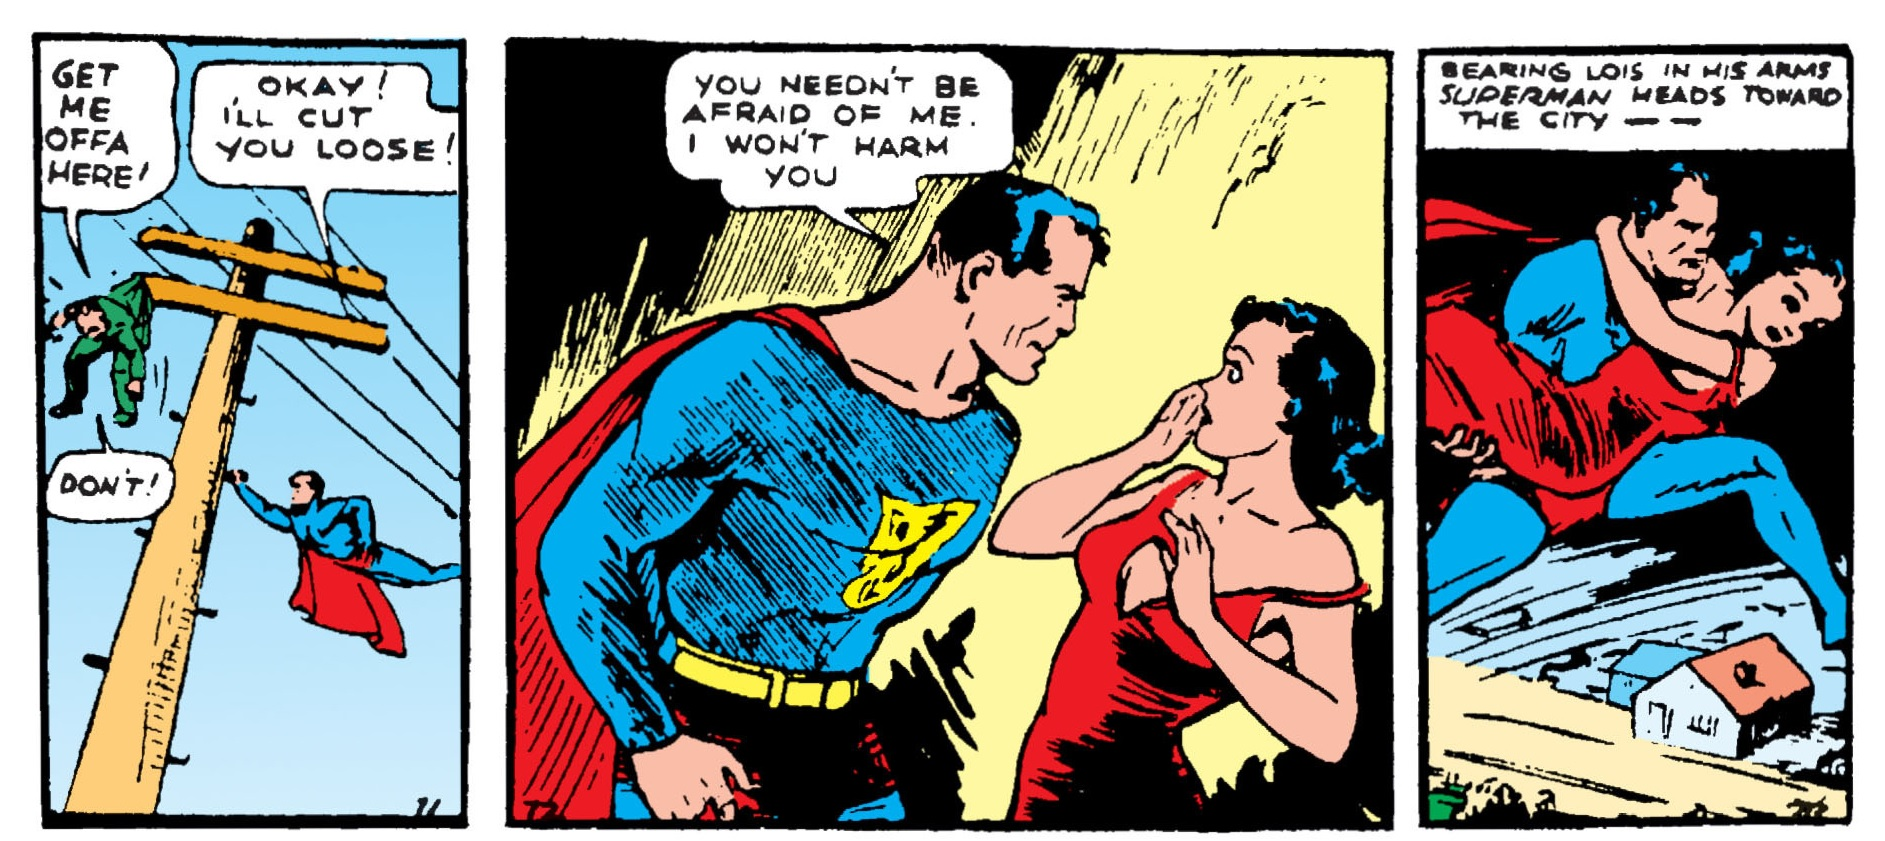 action-comics-1-superman-meets-lois-lane.jpg